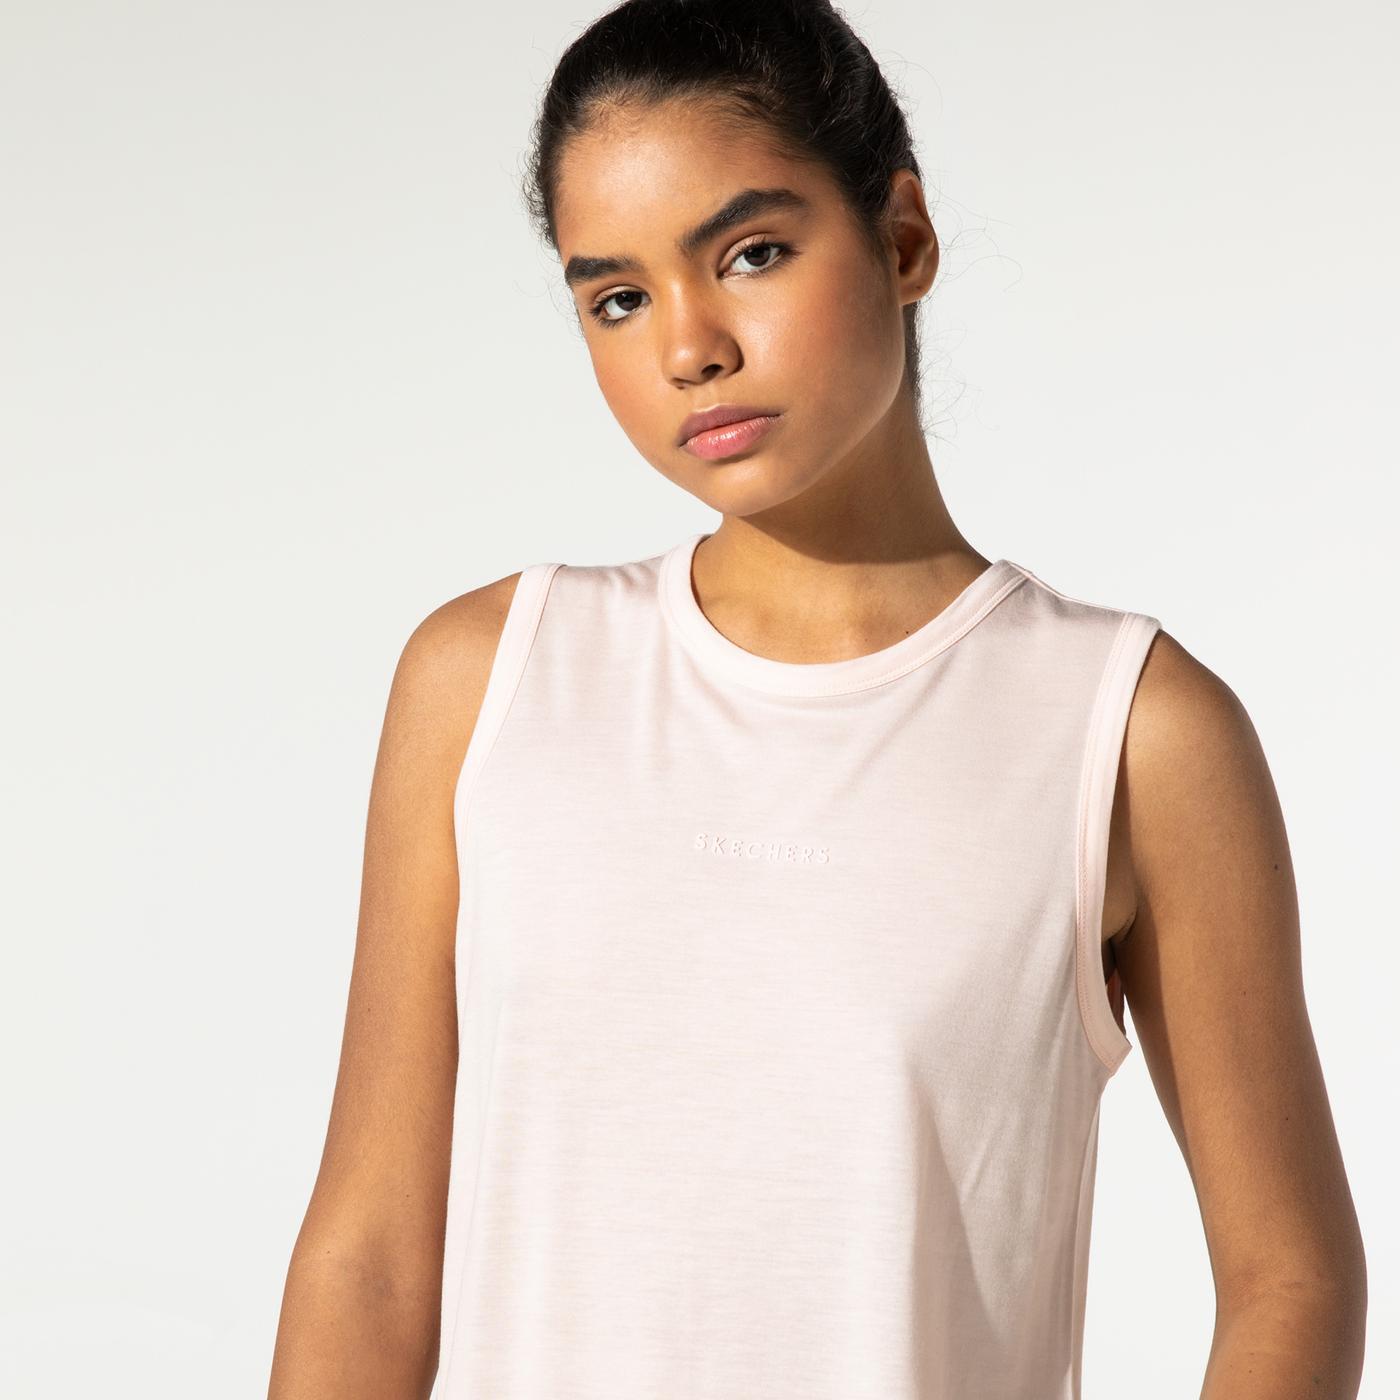 Skechers Graphic Kadın Pembe T-Shirt